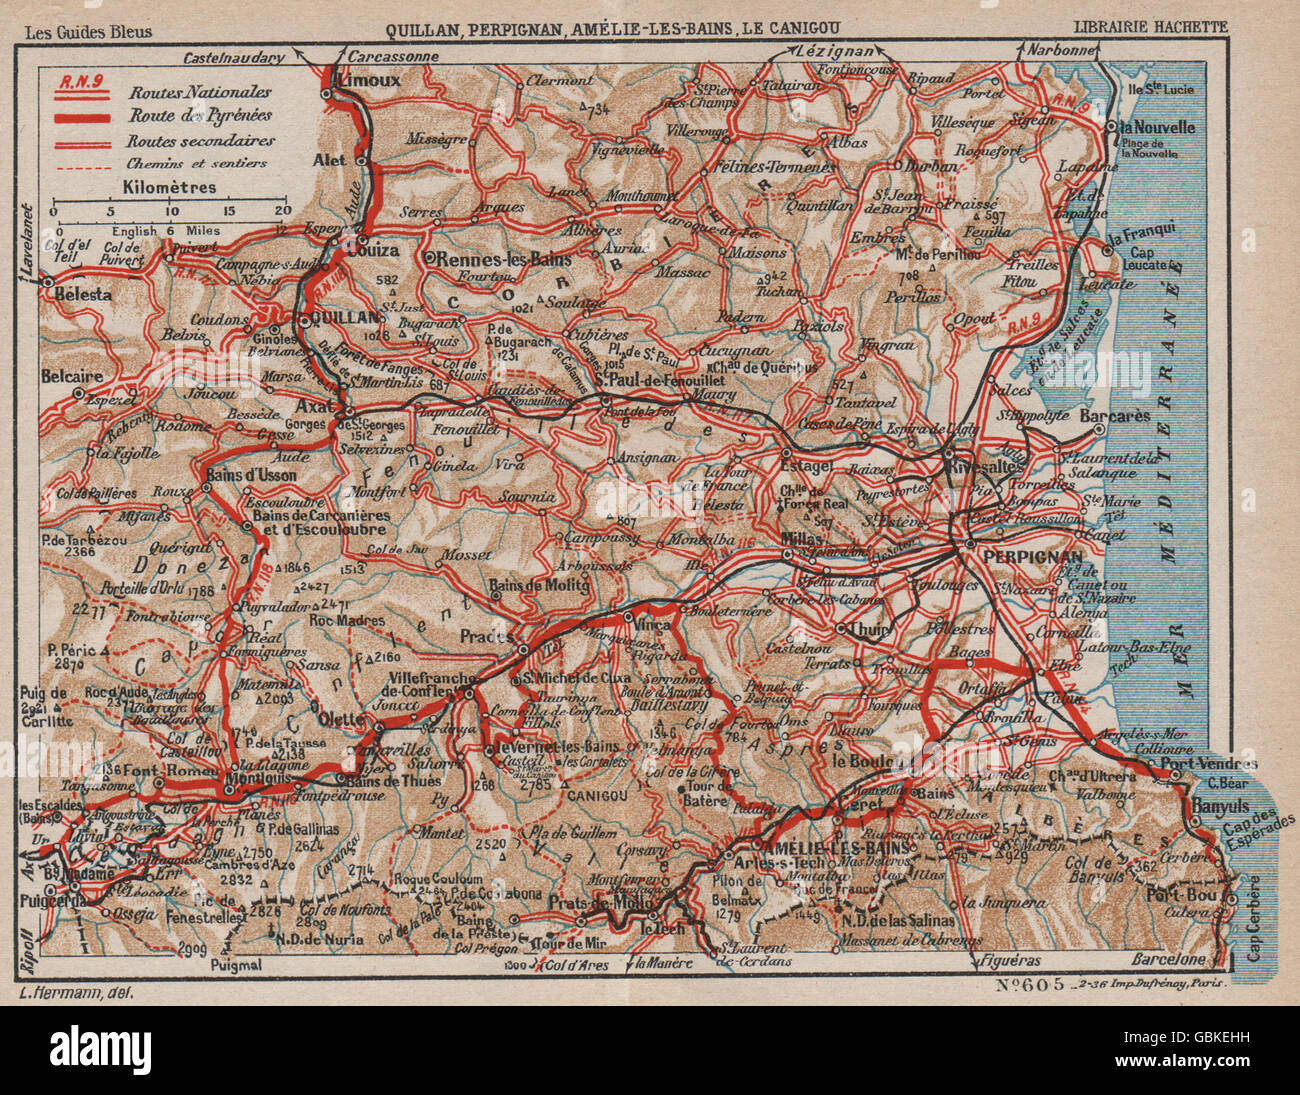 Street Map Of Quillan France.Quillan Pyrenees Stock Photos Quillan Pyrenees Stock Images Alamy